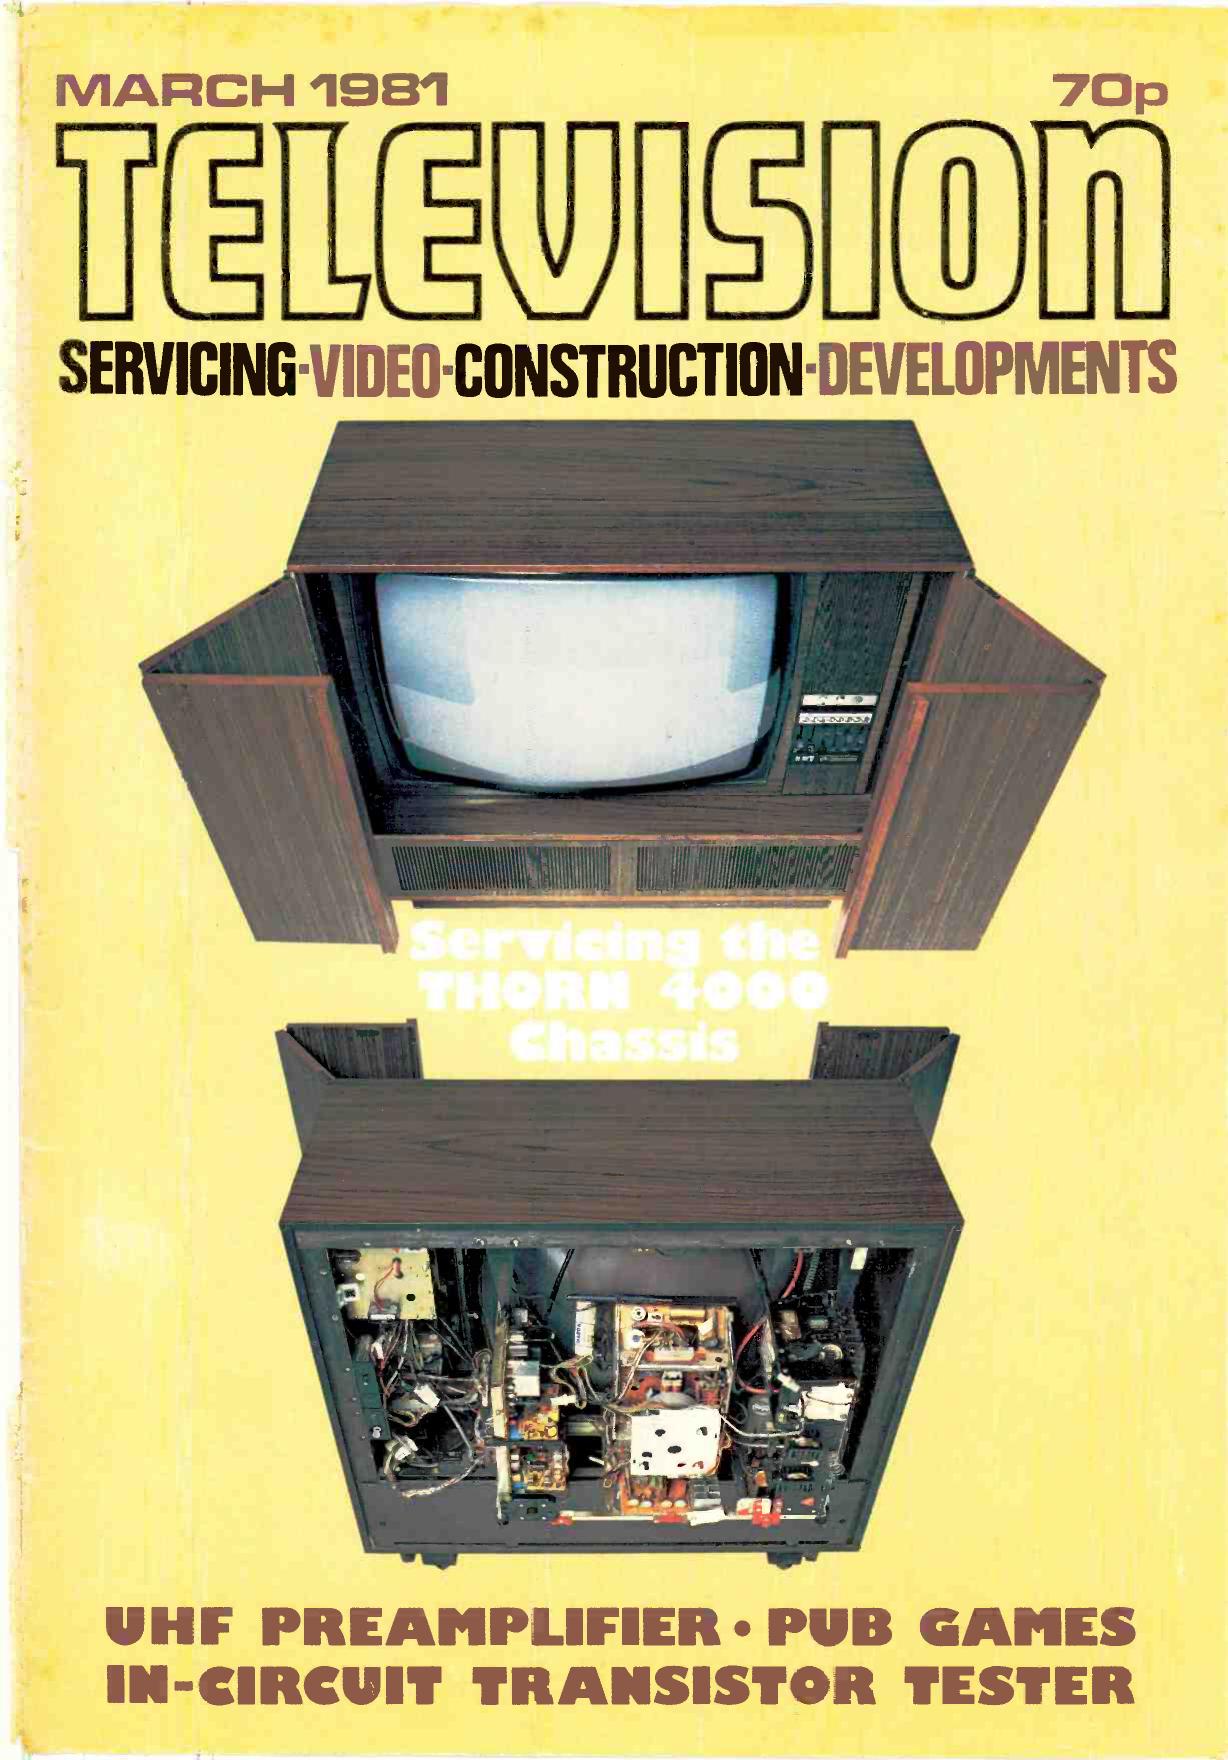 march 1981 0 uhf preamplifier pub games | manualzz com